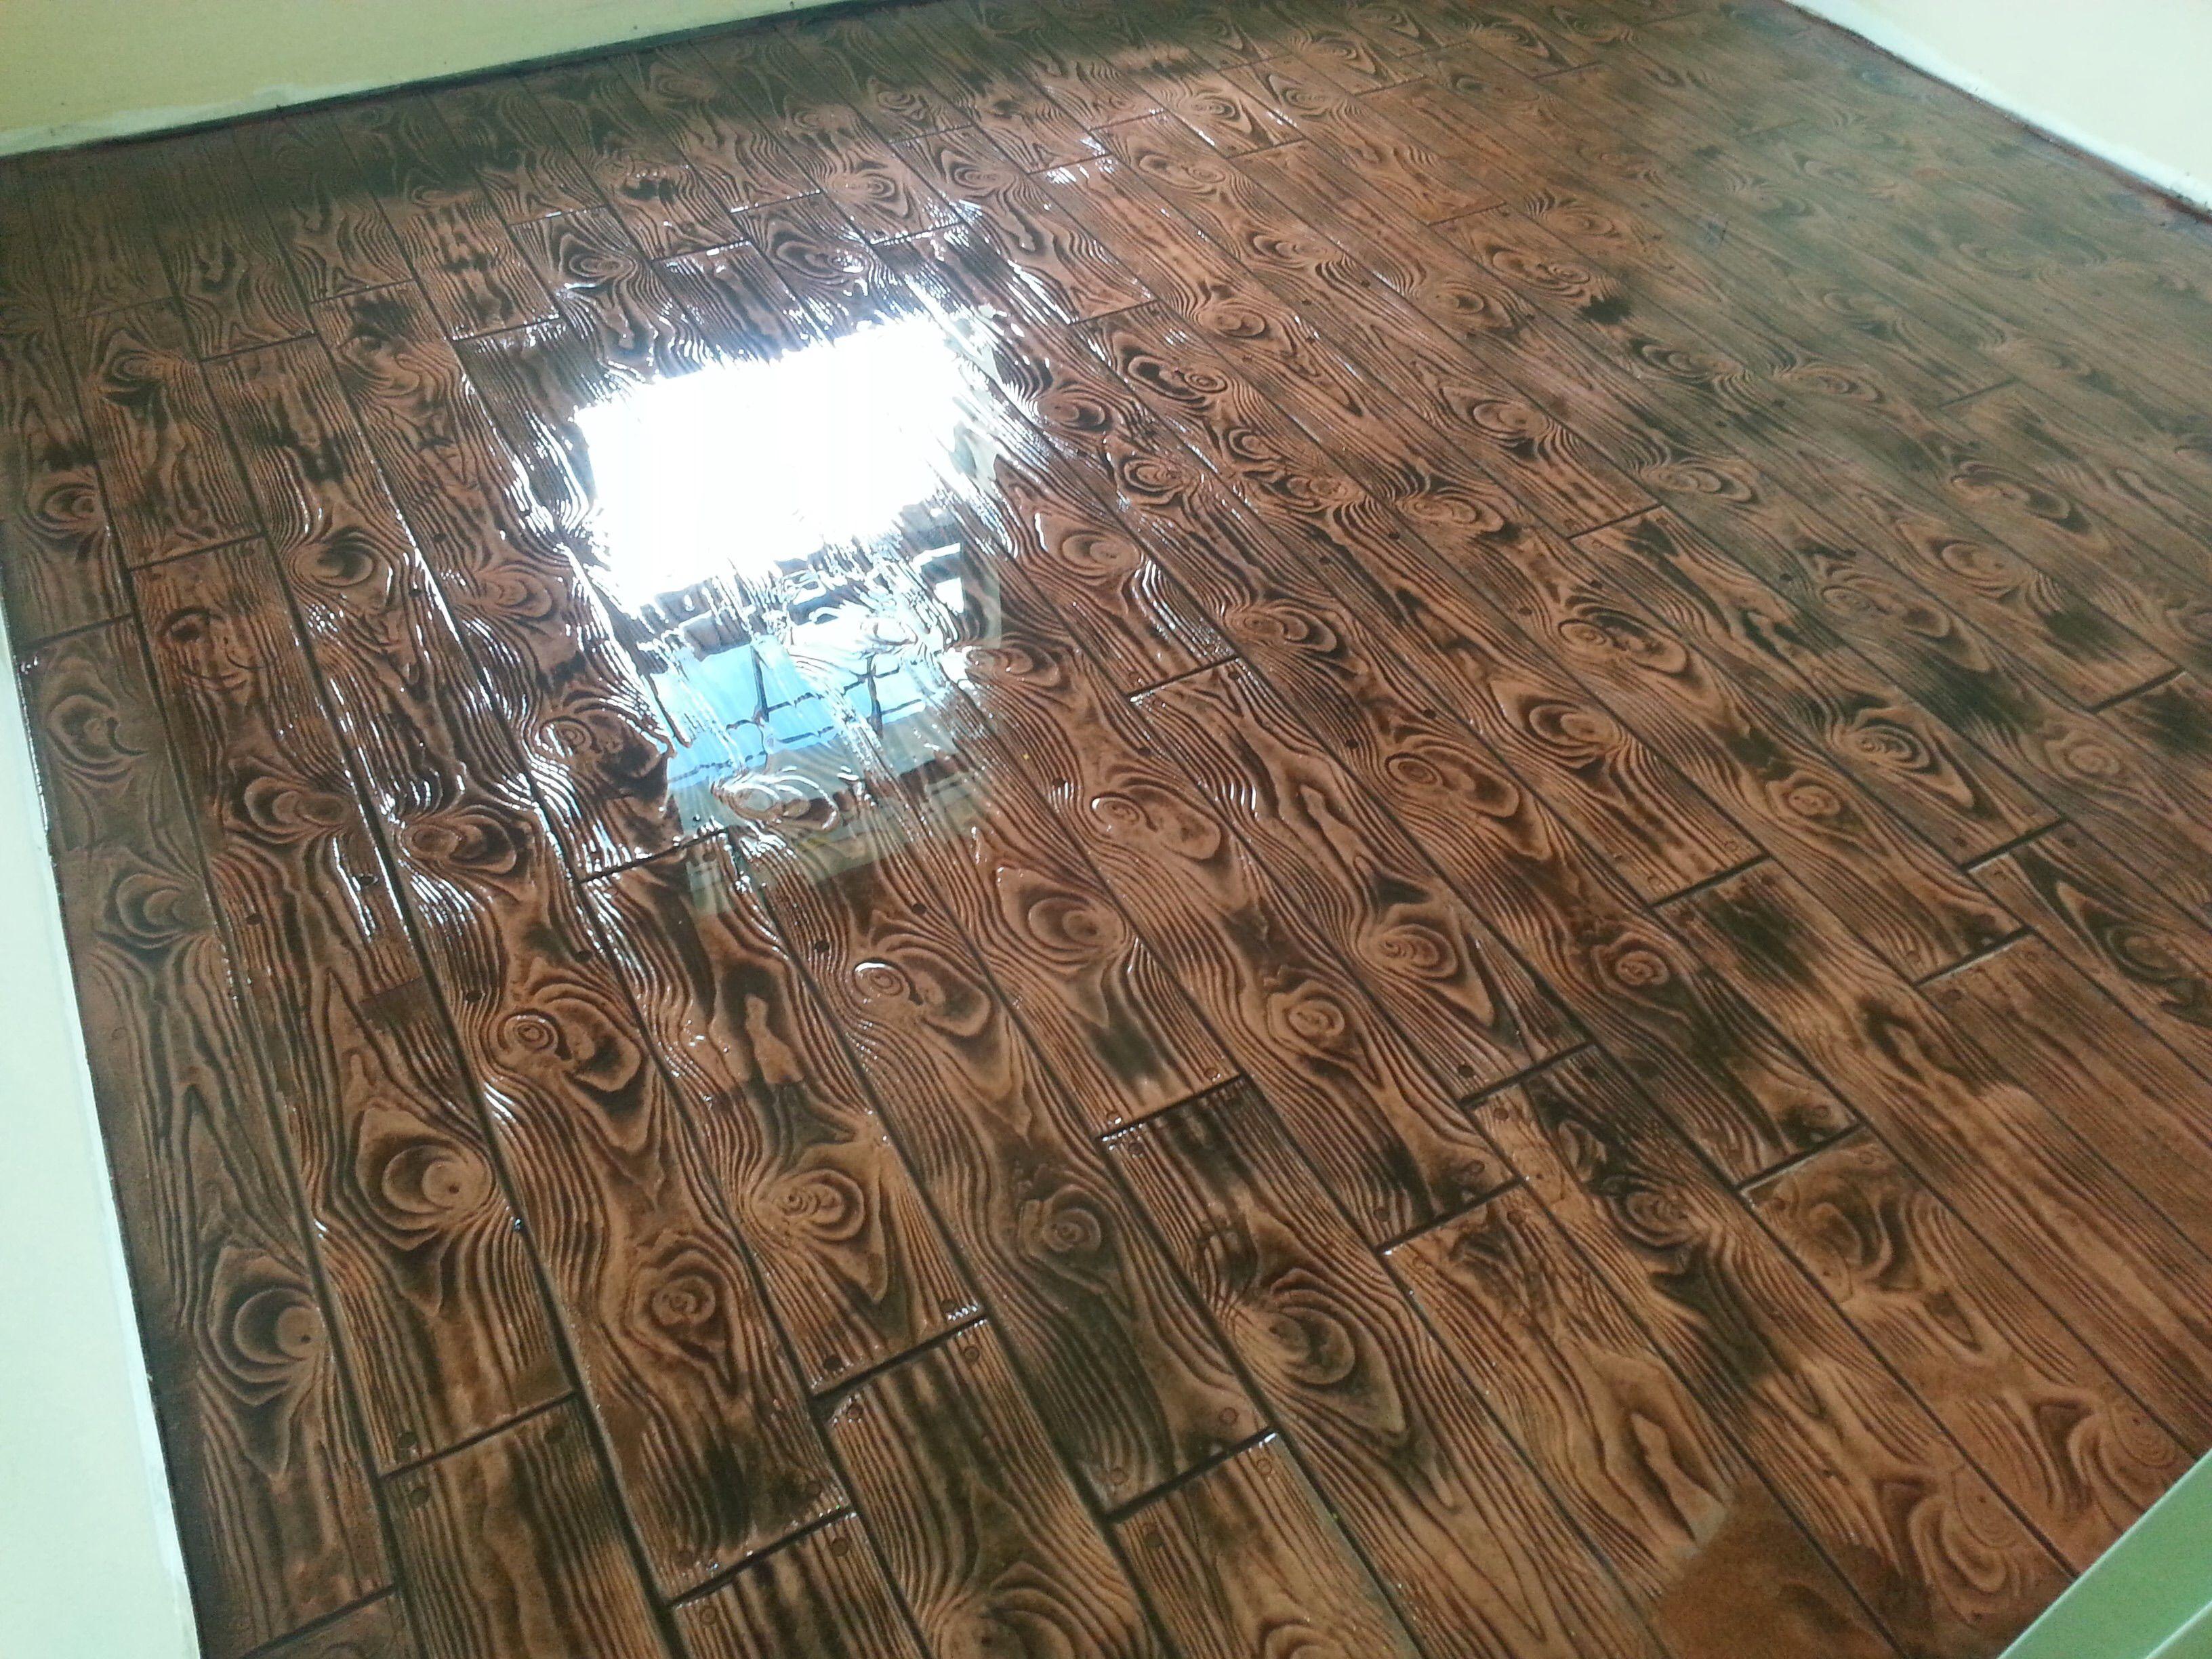 Stamped Comcrete Wood Plank With A Epoxy Finish Pisos De Porcelanato Liquido Piso De Porcelanato Pisos